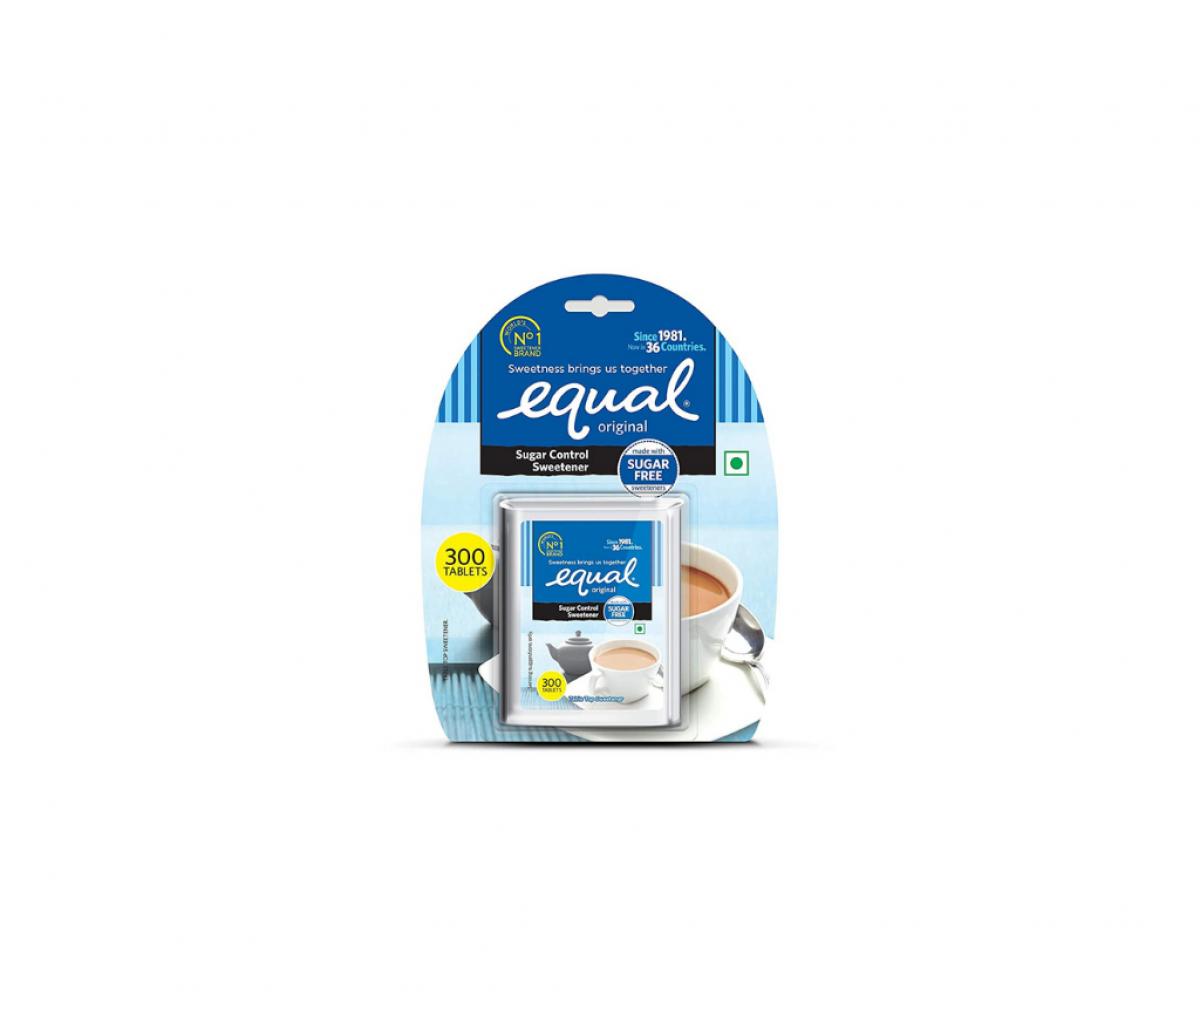 Equal Sugar Free Original Sugar Control Sweetener Tablet